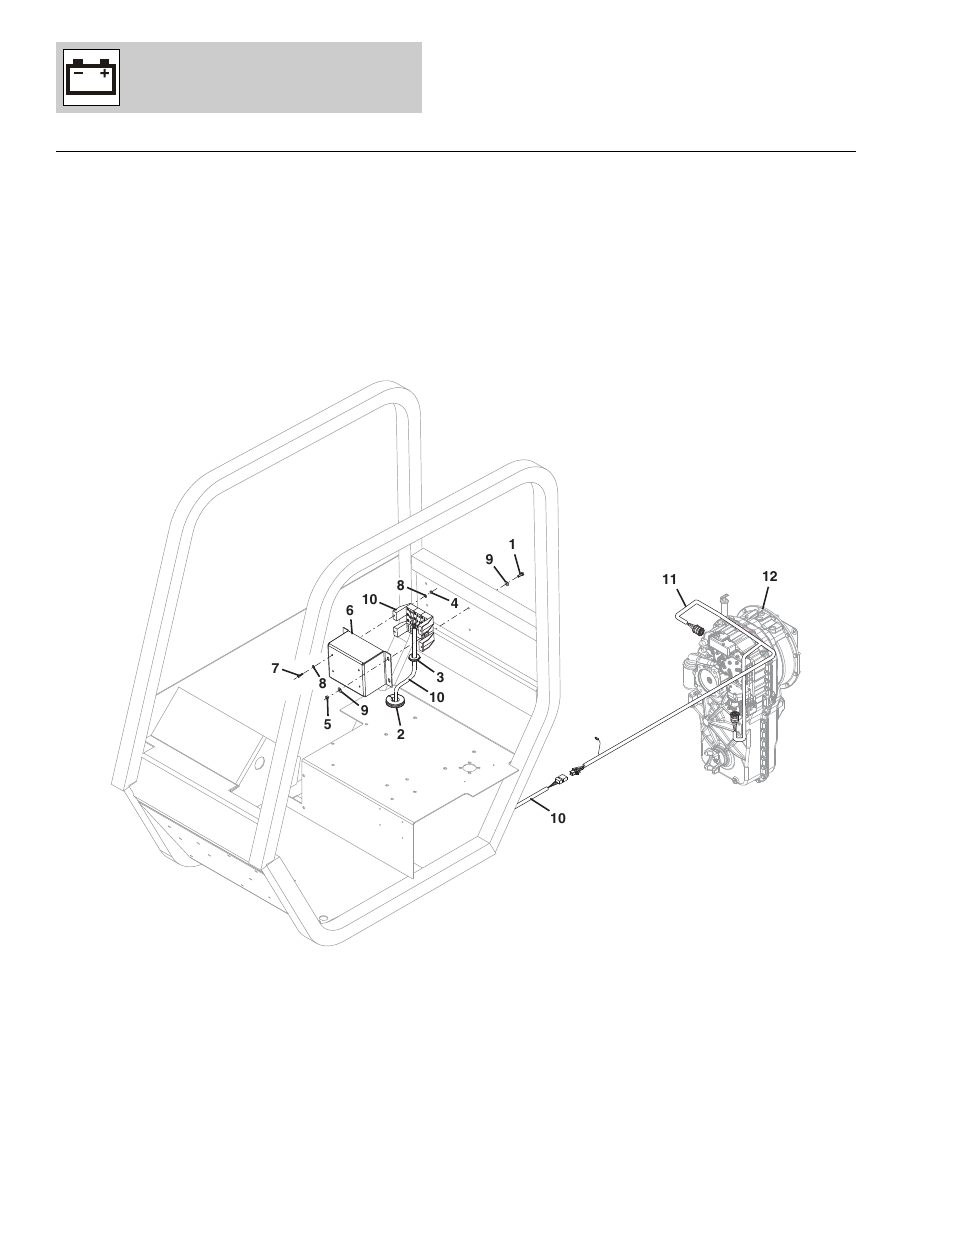 Figure 10-4 transmission harness installation